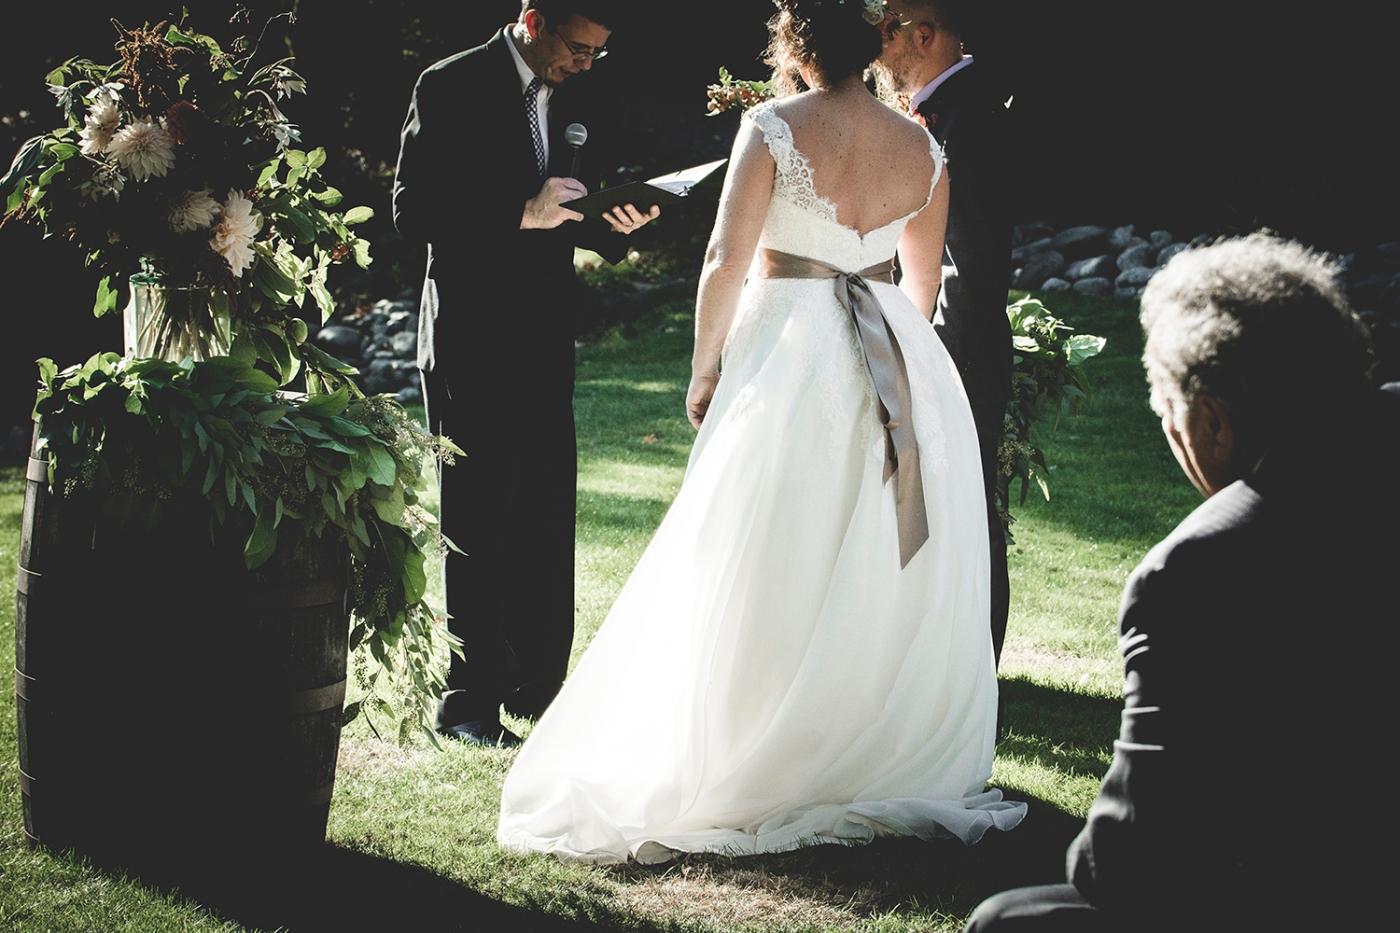 M&R River House Italian Wedding 2015DSC_4241